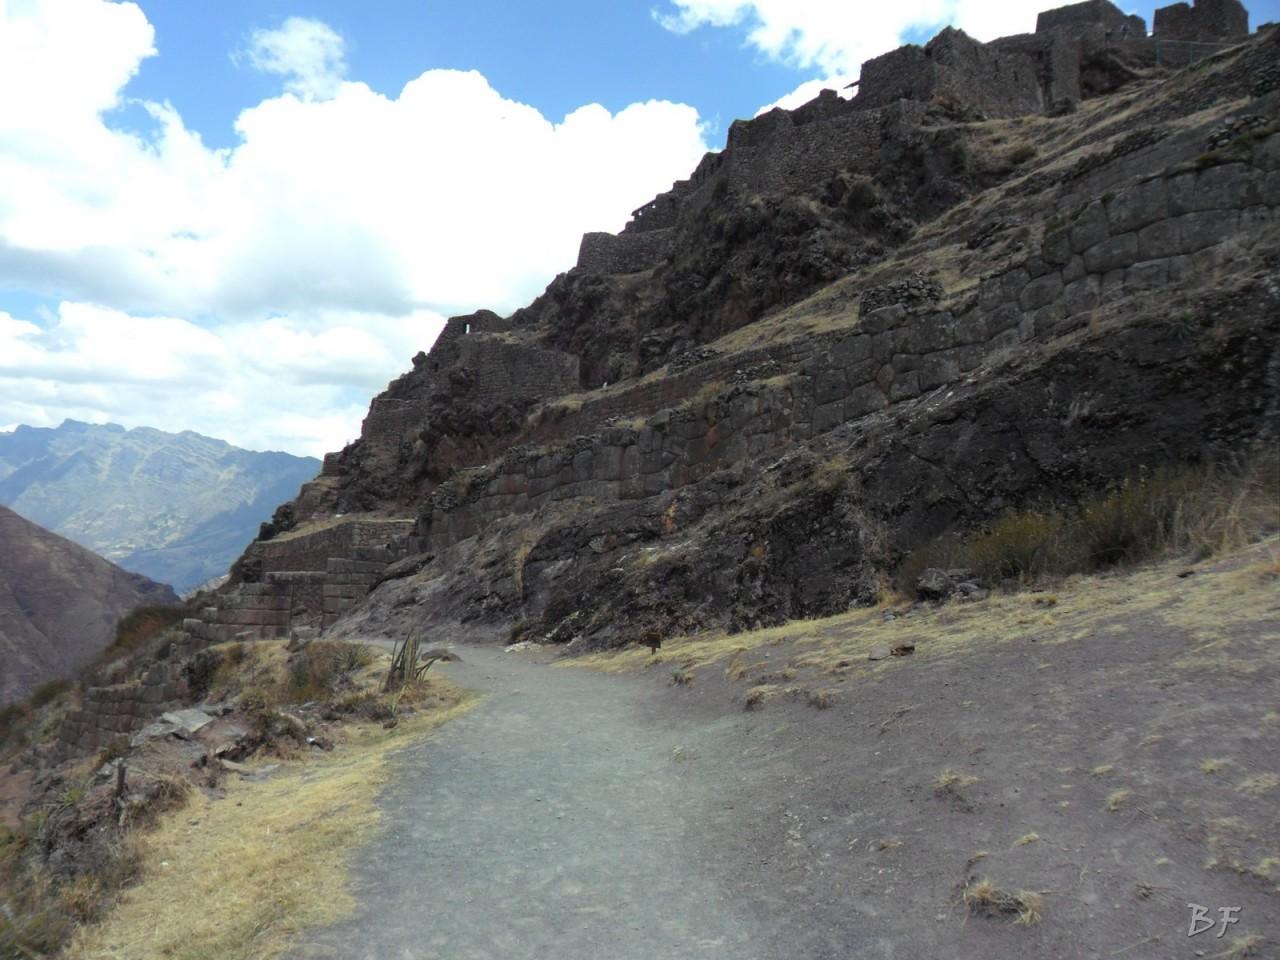 Mura-Poligonali-Megaliti-Altari-Rupestri-Pisac-Cusco-Perù-23